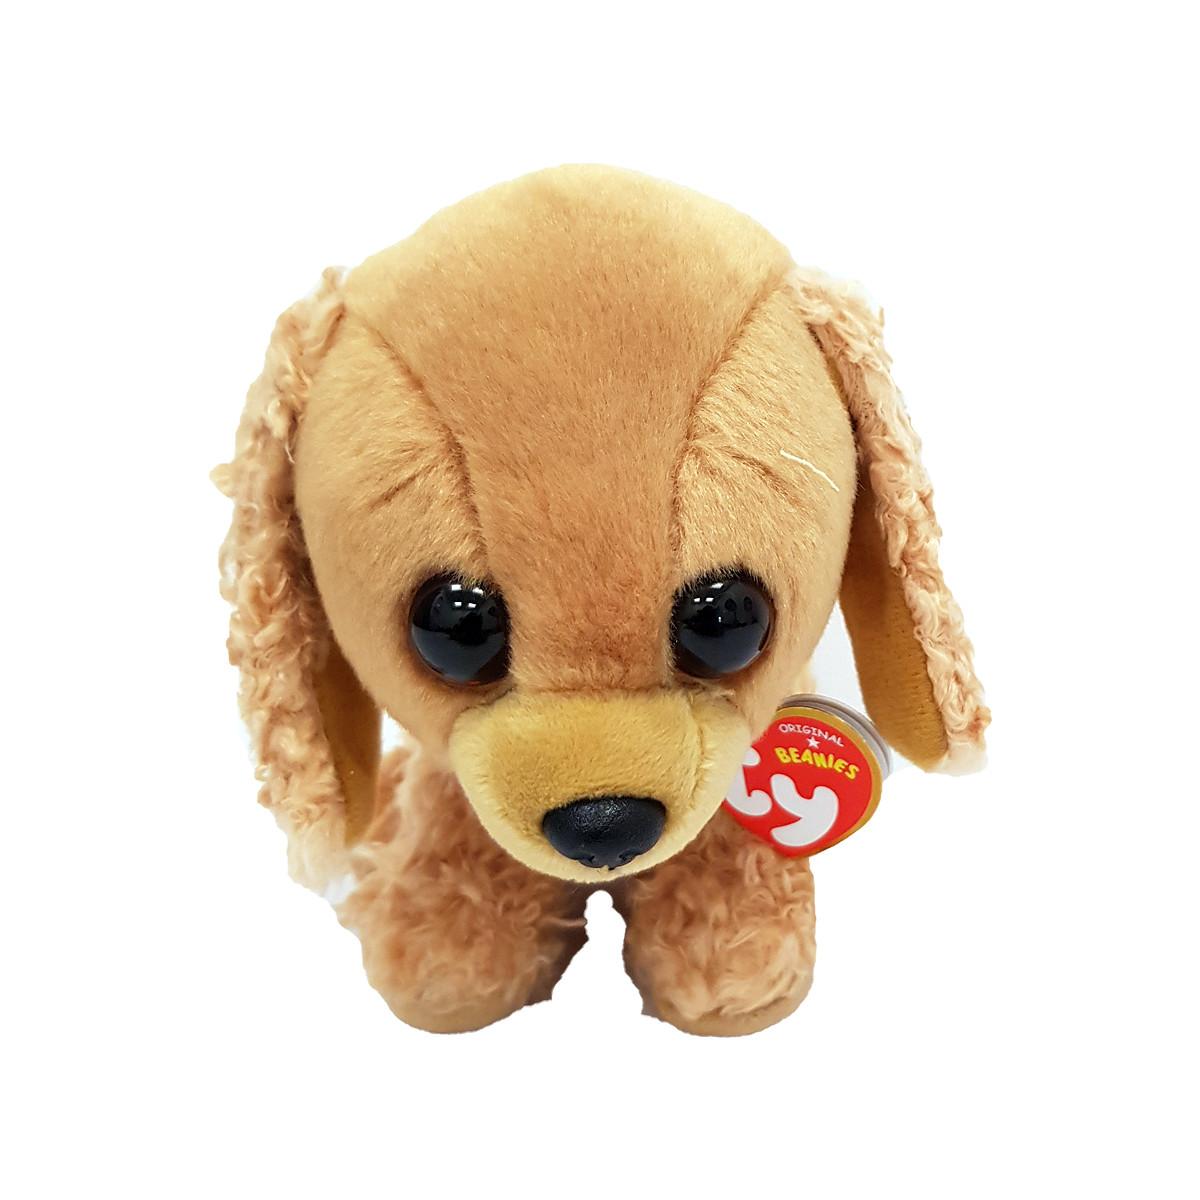 252f10912fc Age  18 months+. Ty Beanie Babies 15cm Soft Toy - Sadie